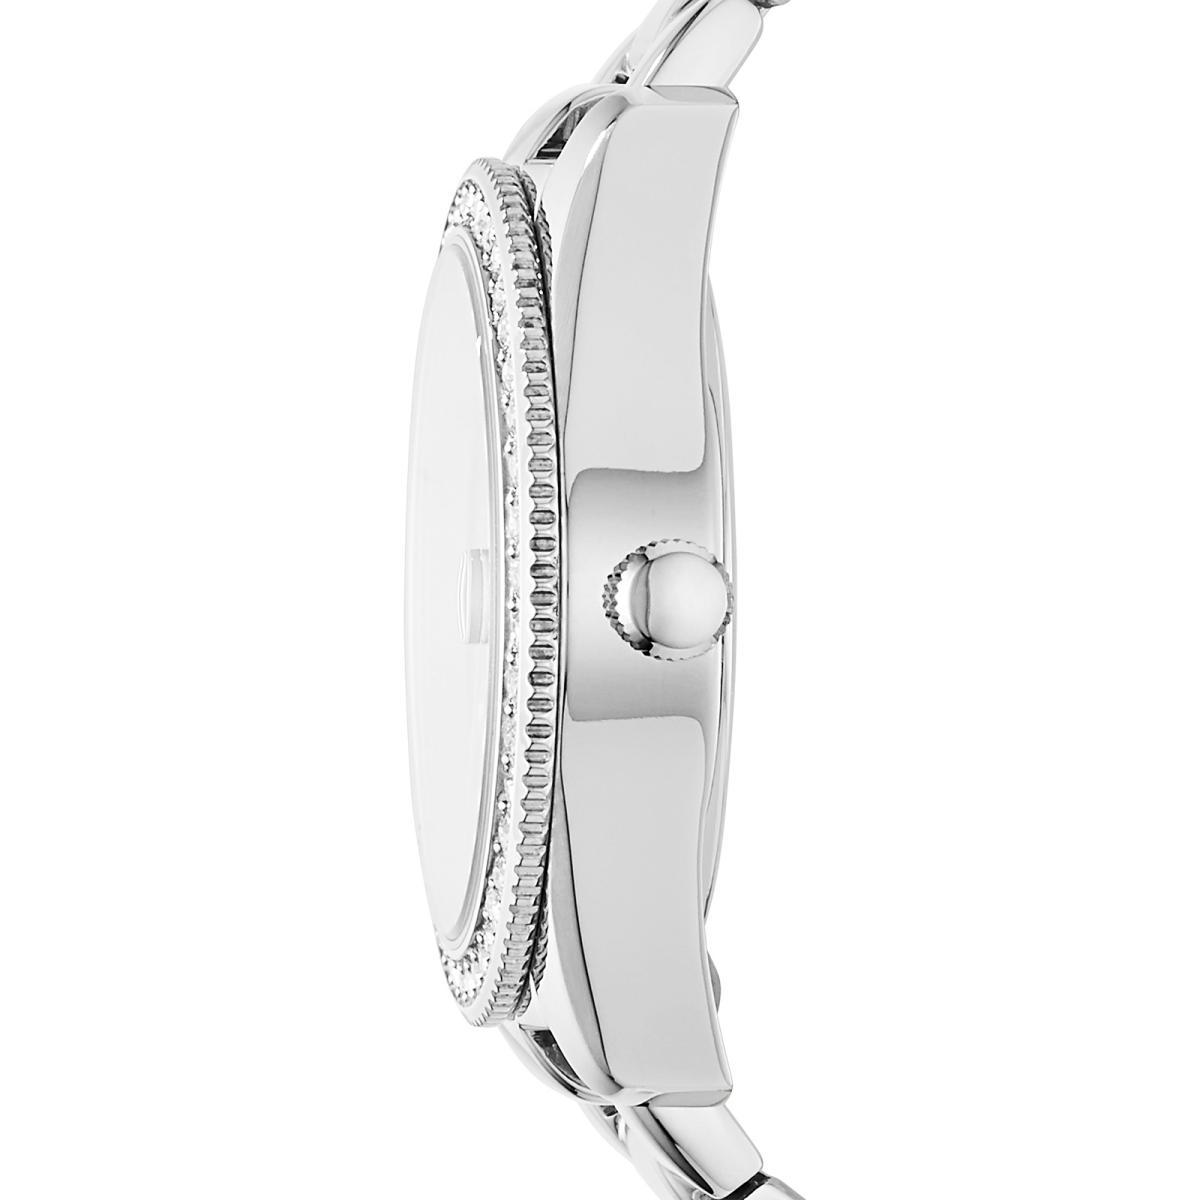 dc39ffeff36c Reloj Fossil - ES4317 - Mujer - Time Square